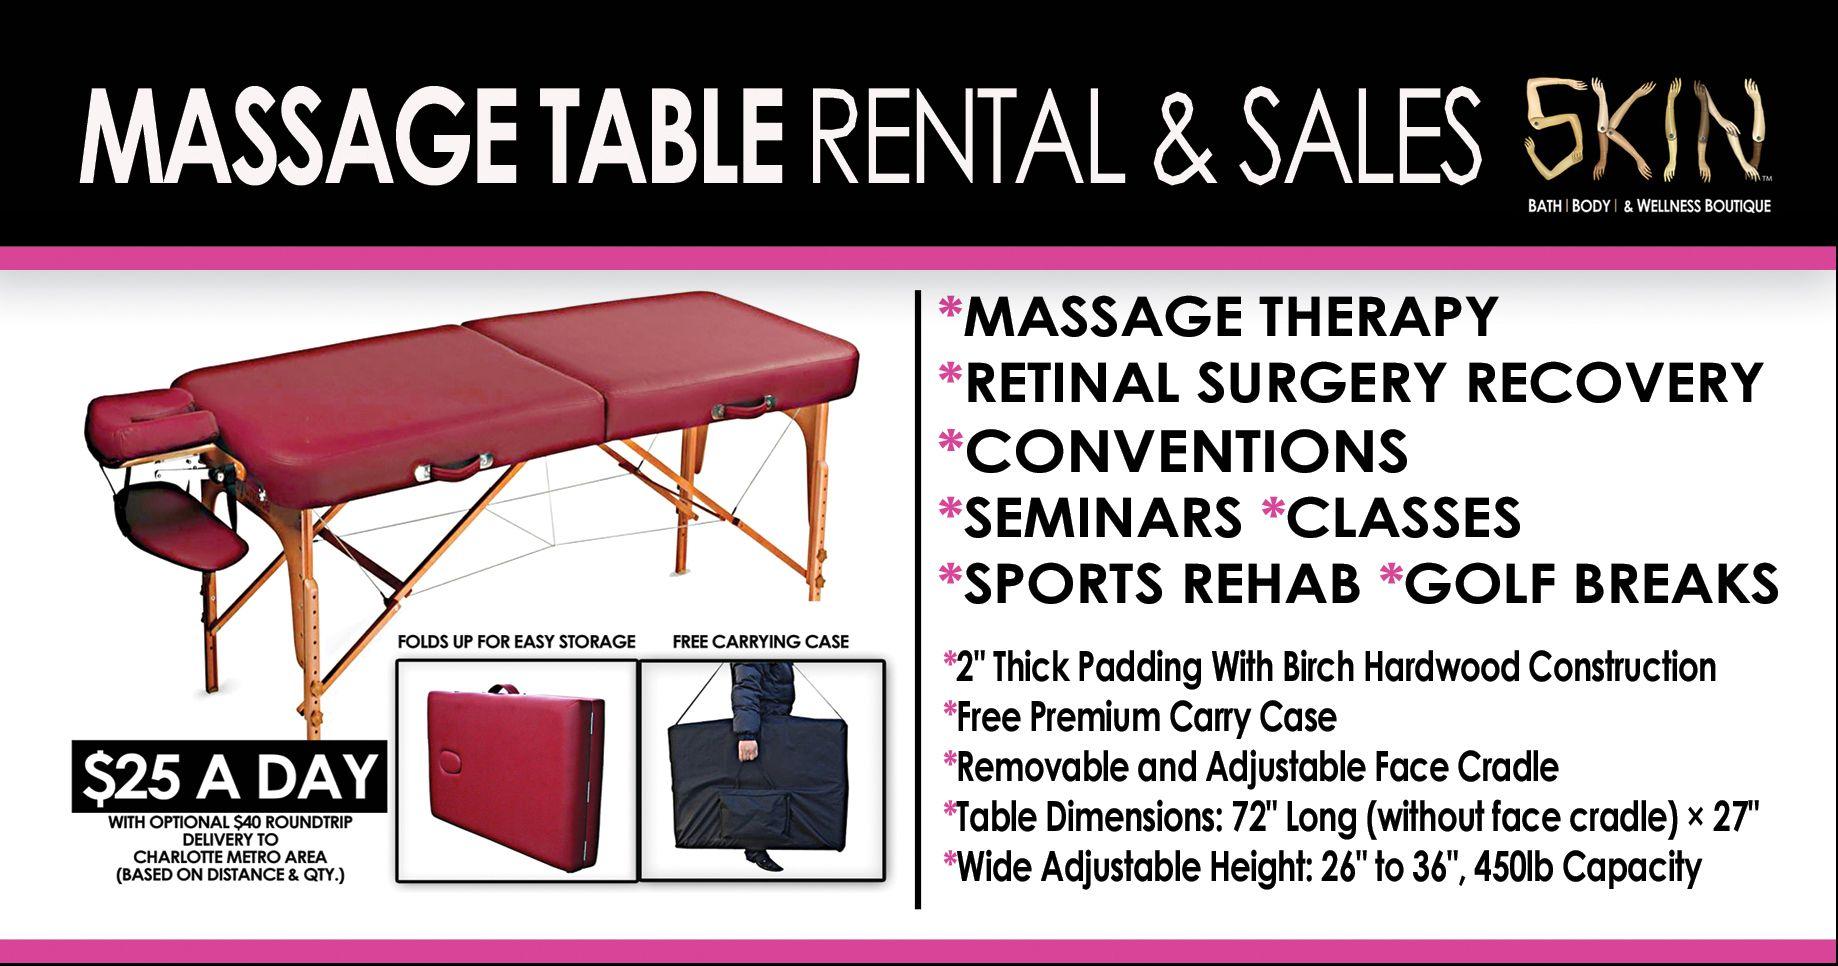 MASSAGE TABLE RENTAL CHARLOTTE $25 A DAY. Email: skincharlotte@gmail for more details or visit http://www.skinwellnessboutique.com/